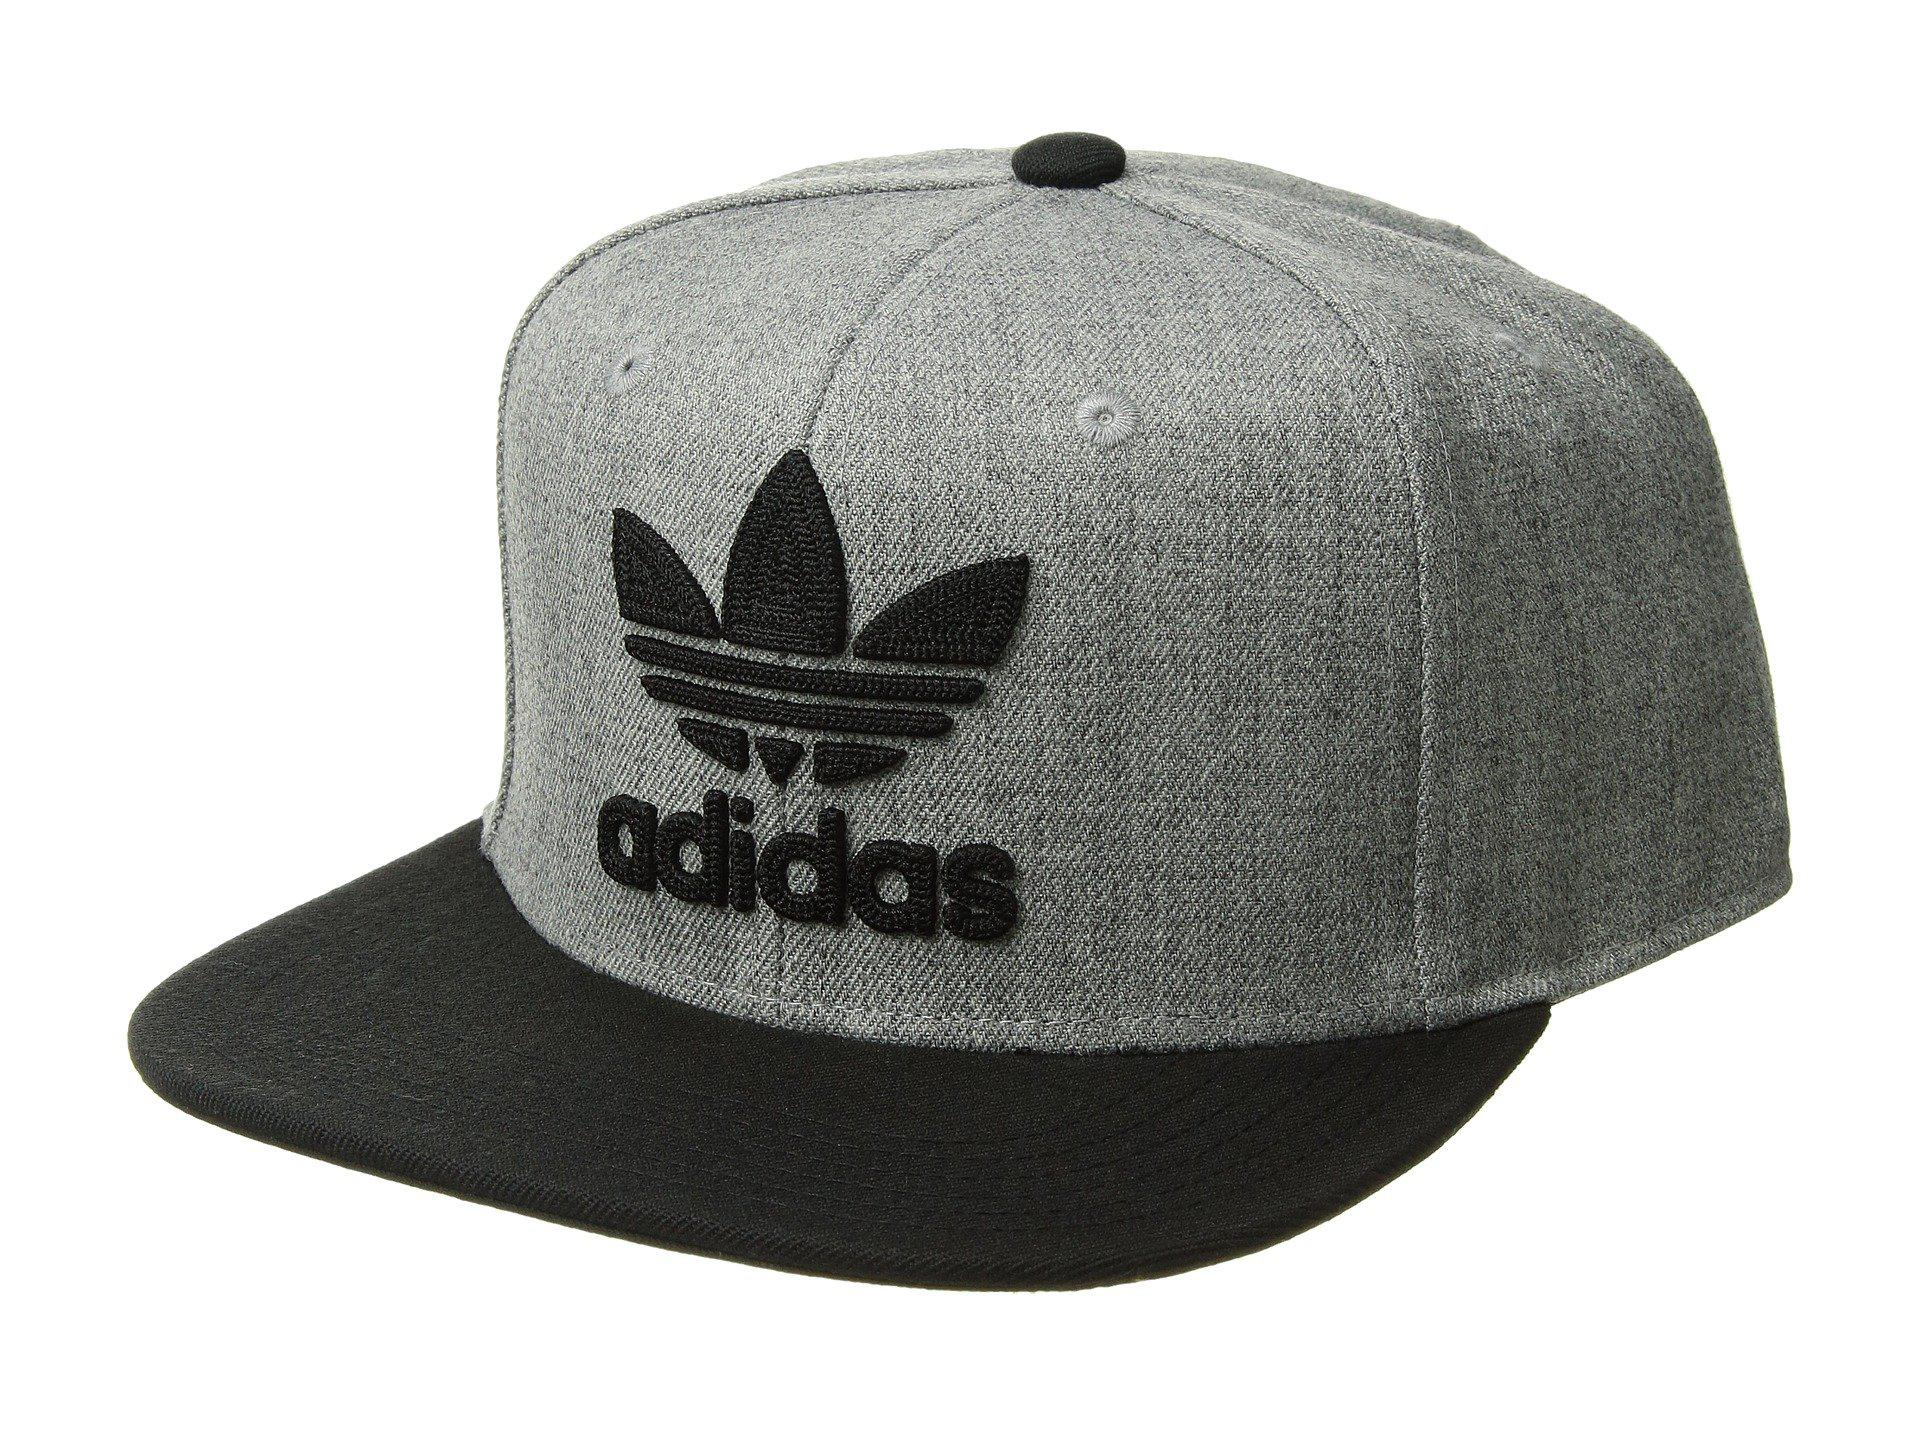 Lyst Adidas Originals Originals Trefoil Chain Snapback Cap